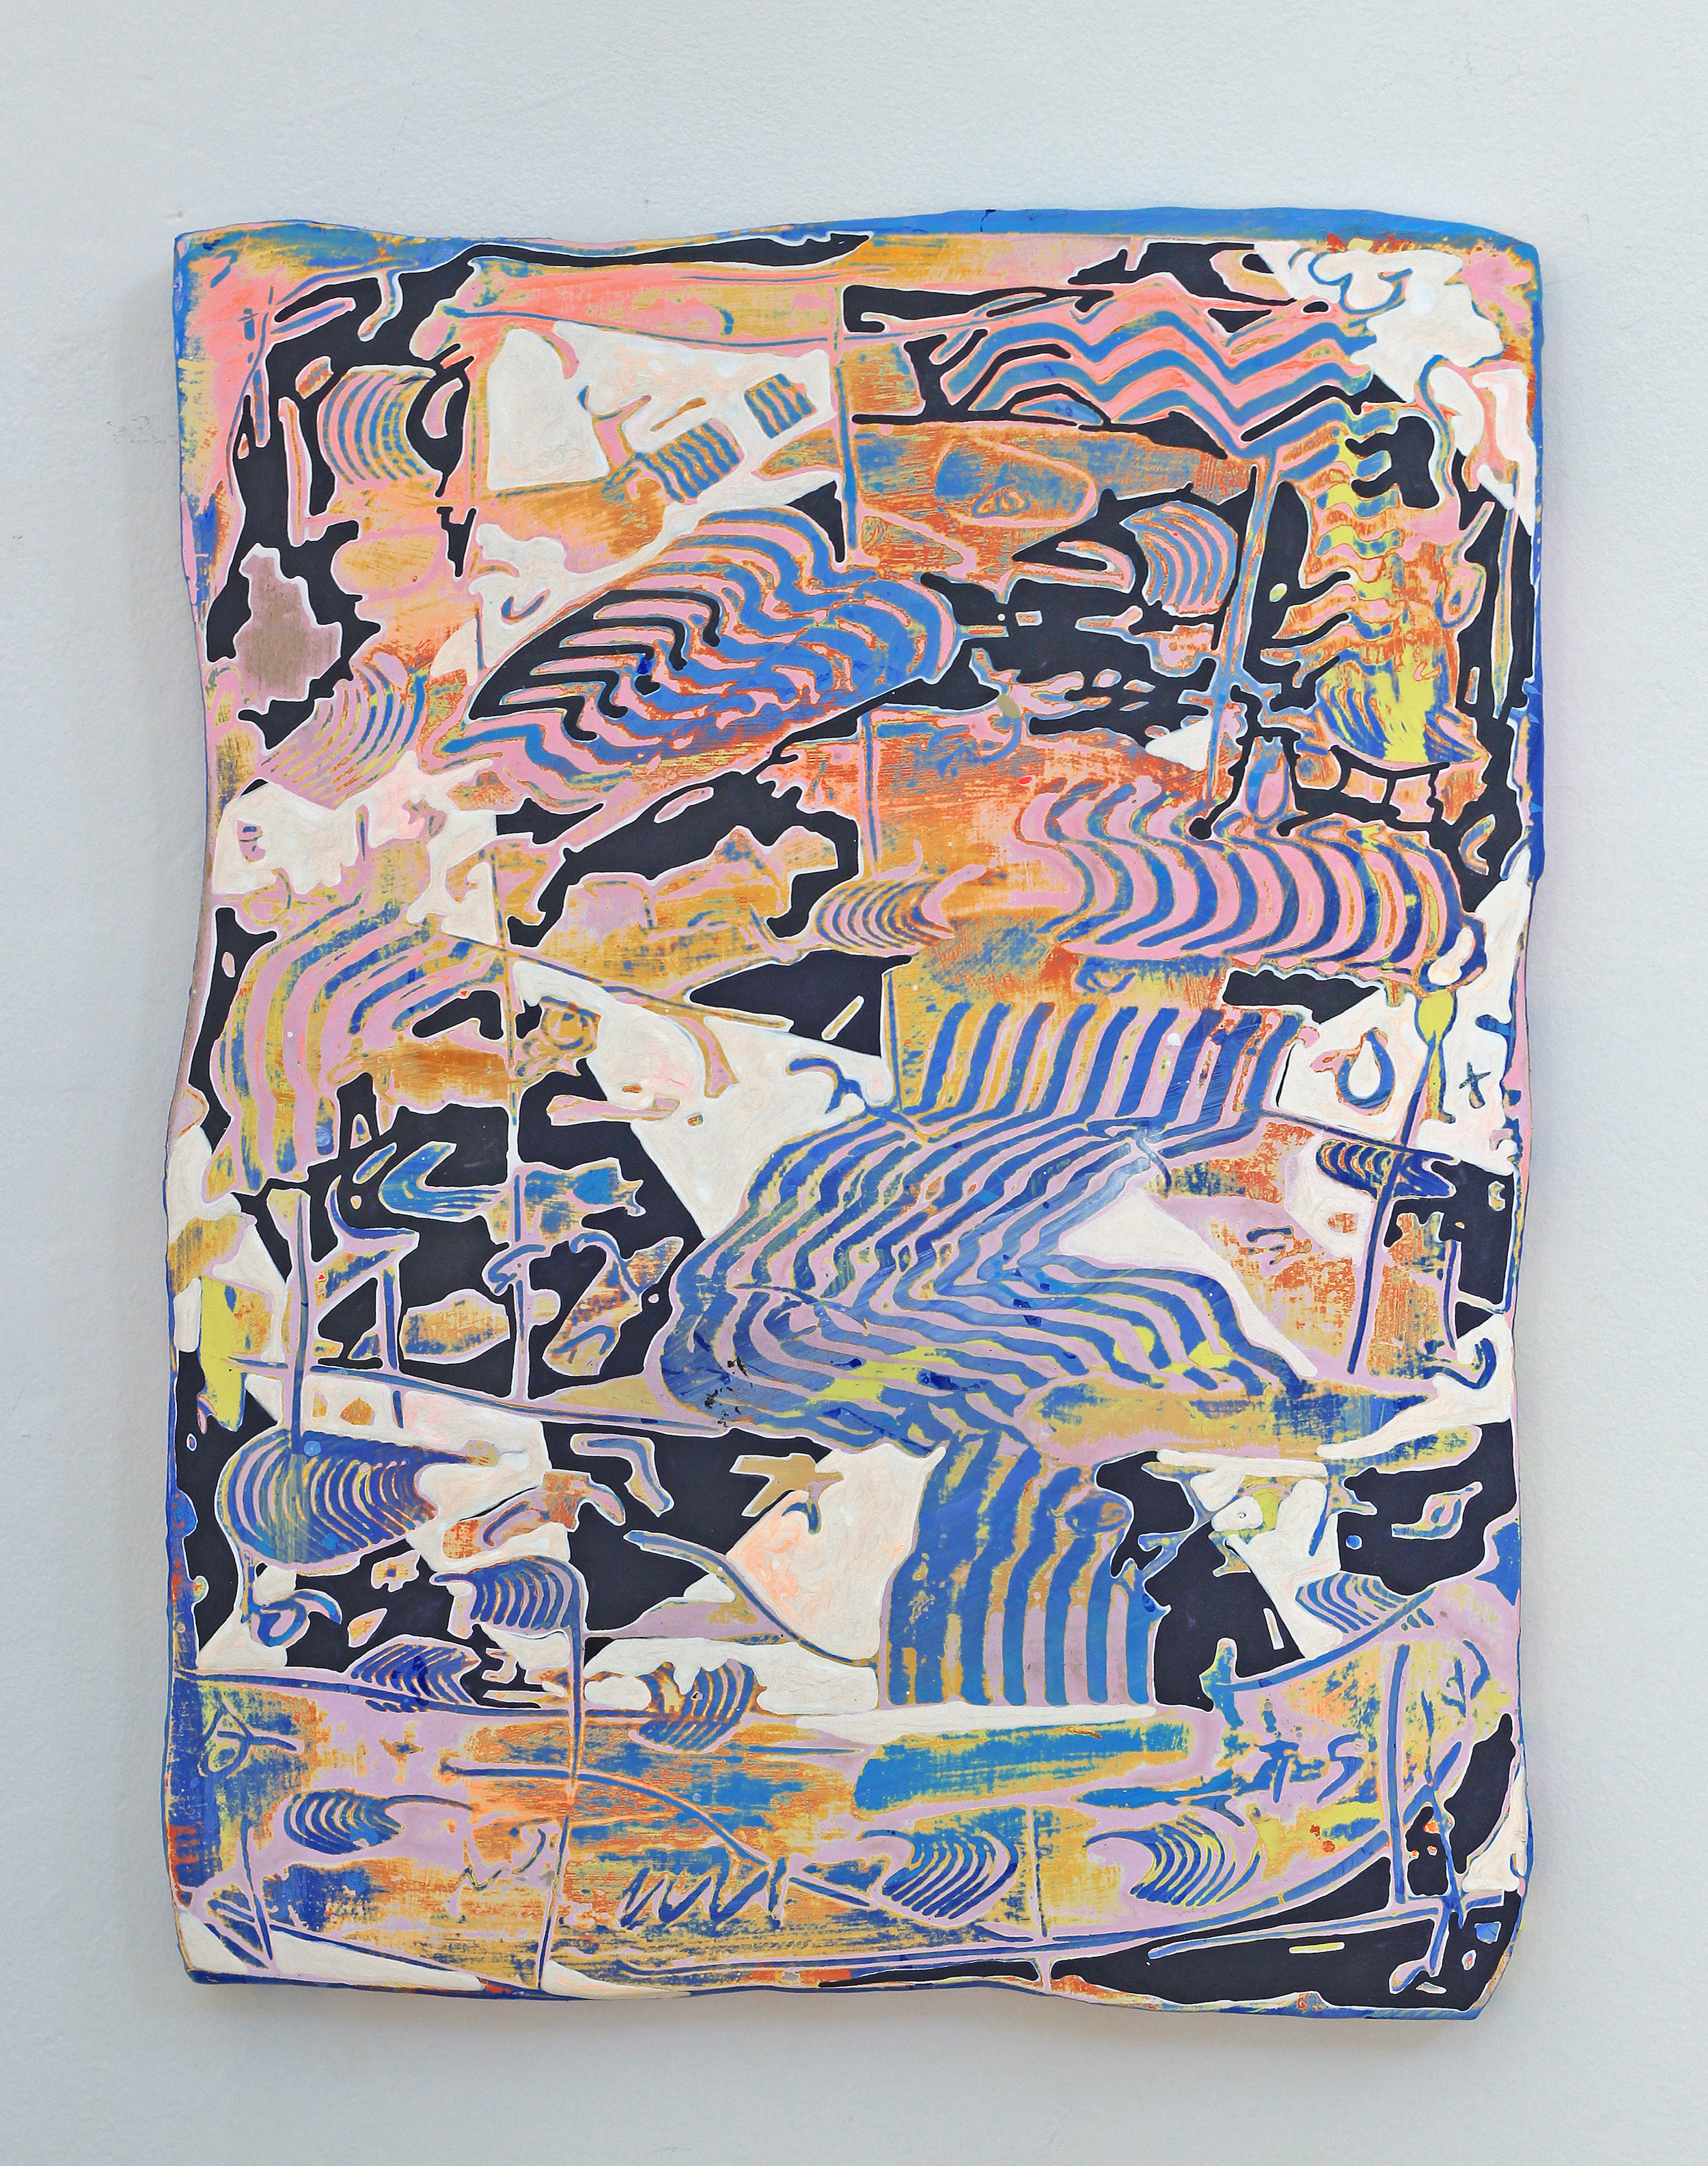 Soft Shock  . Jenna Pirello, Acrylic on wood, 18 x 14 in.